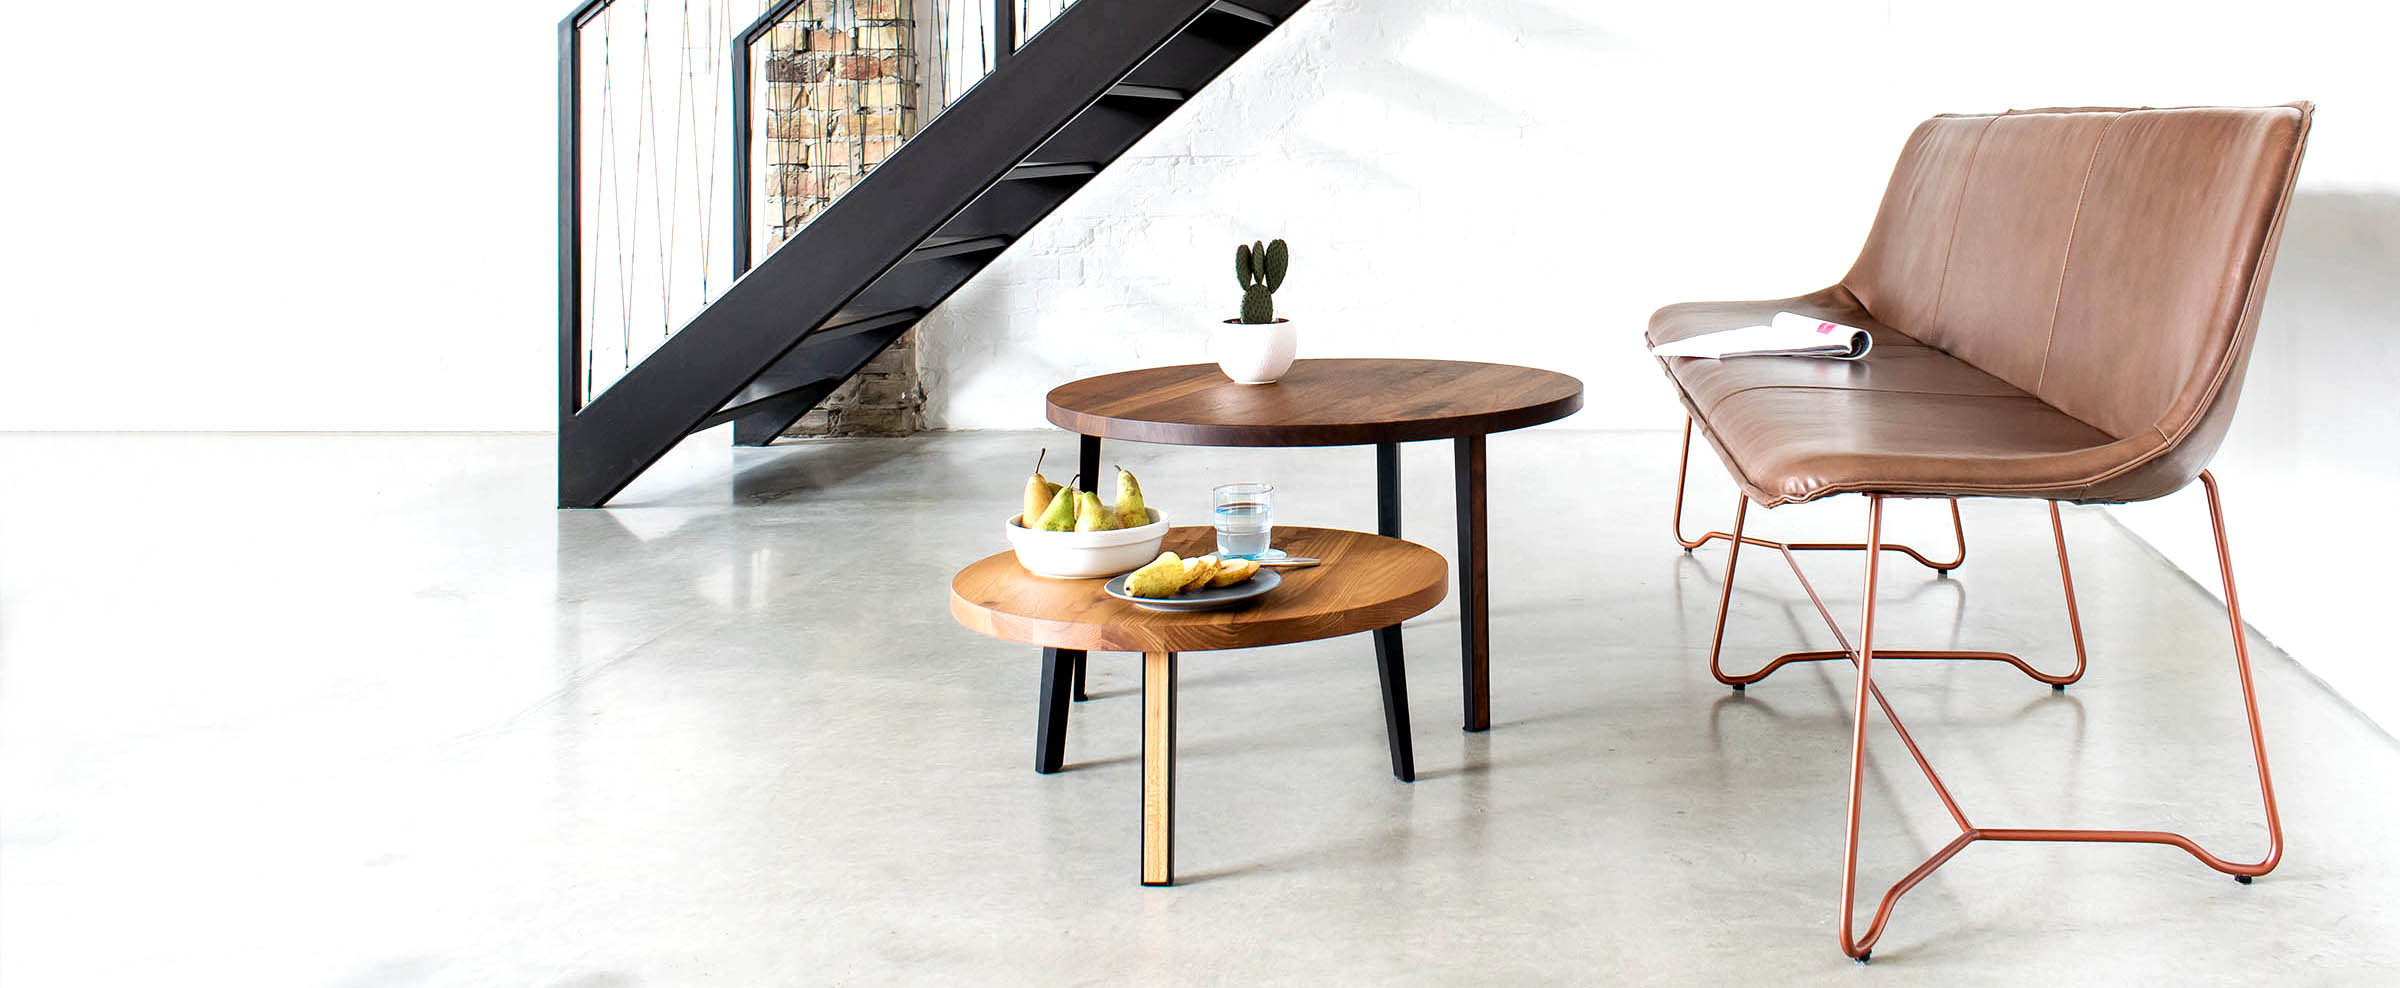 Design Lederbank Like von MBzwo